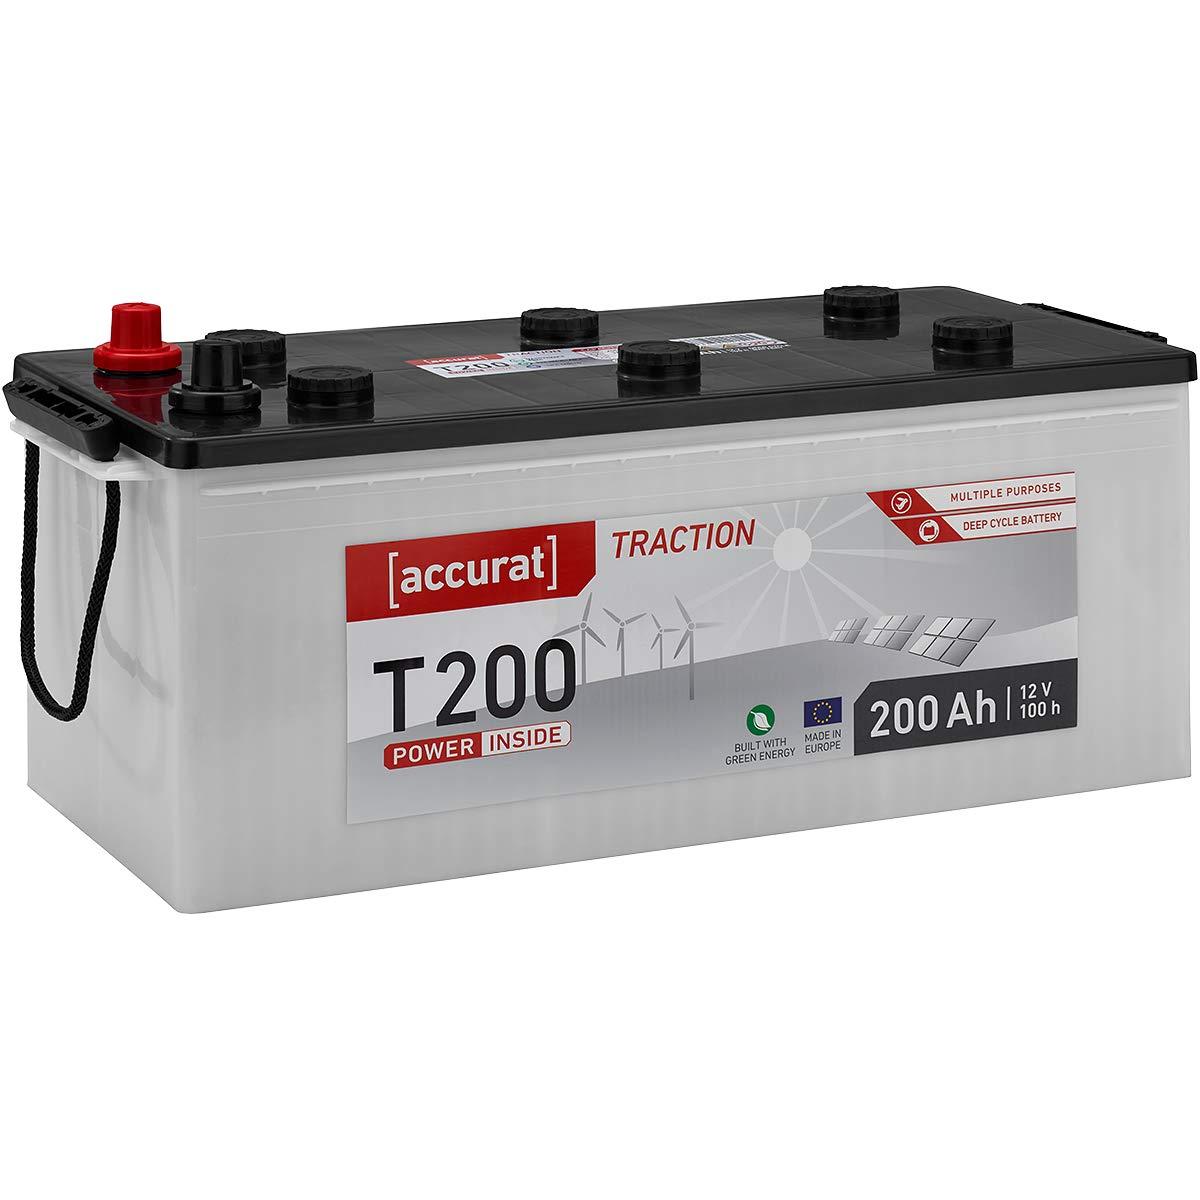 wartungsfrei in 6 Varianten Accurat 12V 110Ah Nass Batterie Versorgungsbatterie 90-260Ah